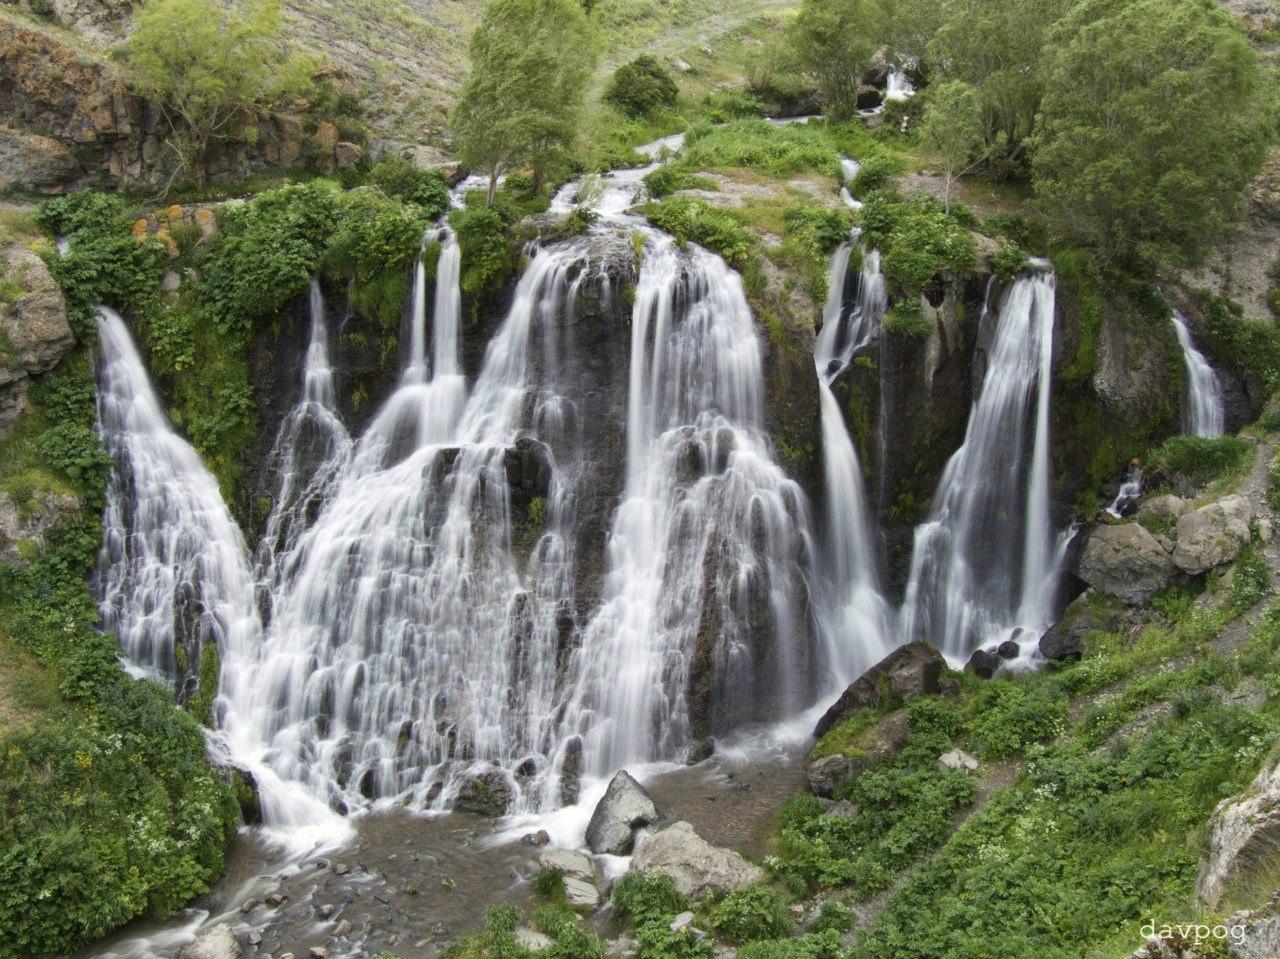 files/images/Shaki_waterfall.jpg